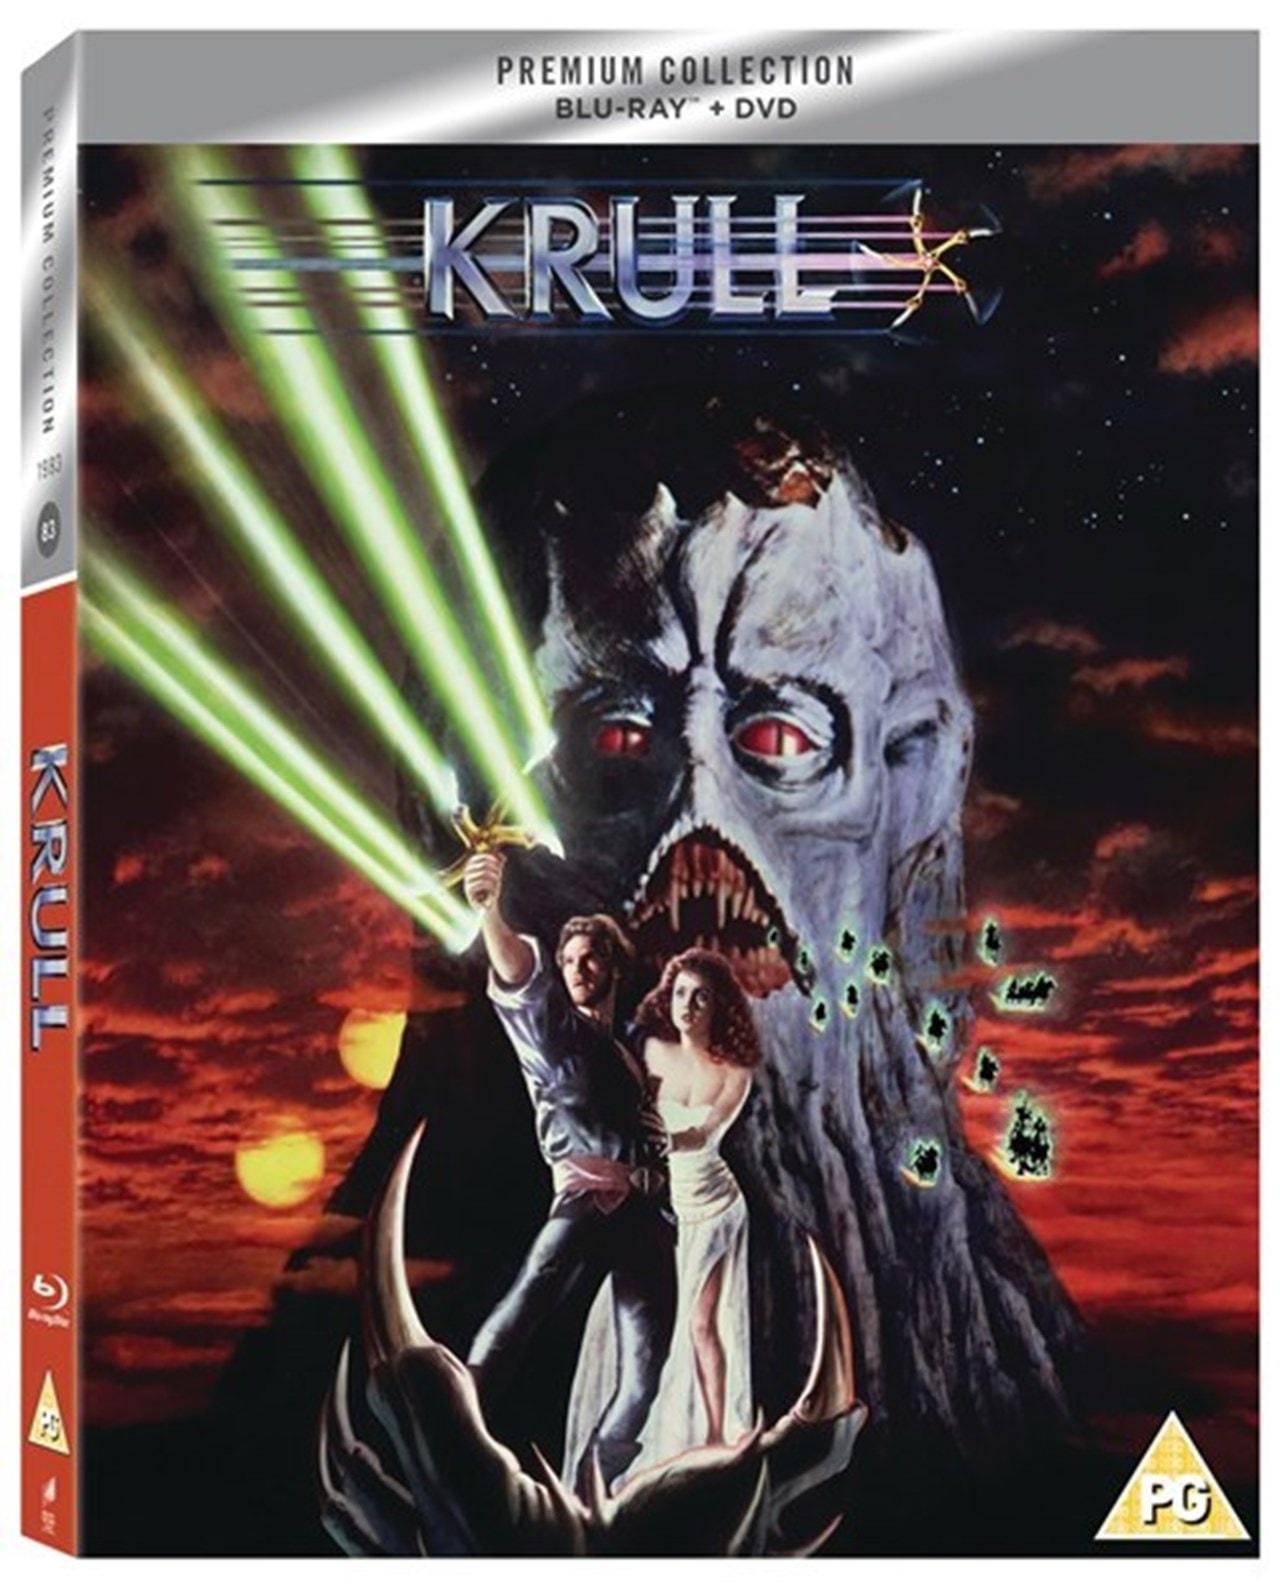 Krull (hmv Exclusive) - The Premium Collection - 2